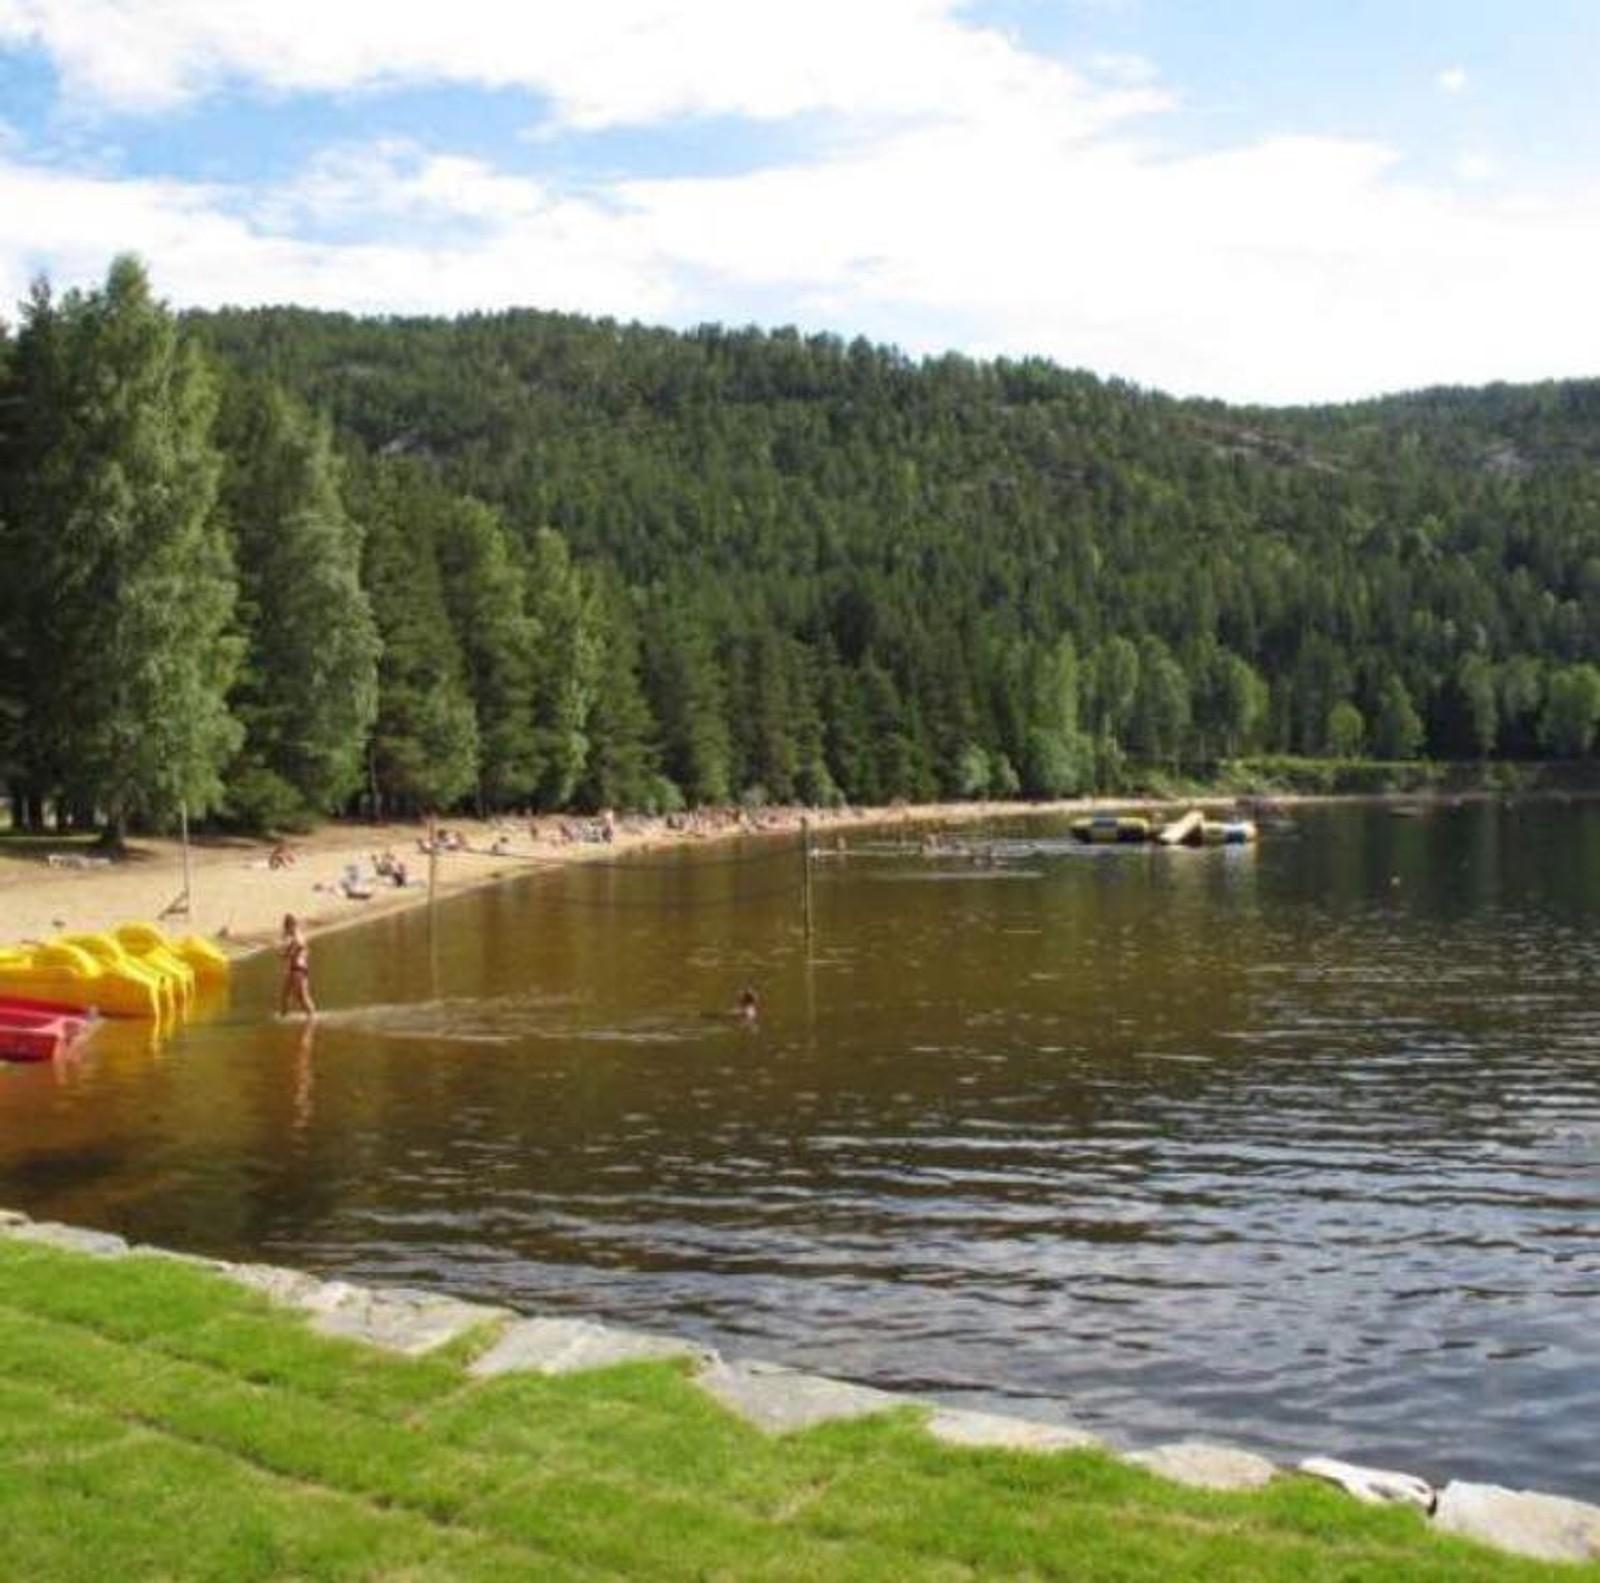 TELNESSANDEN CAMPING I SELJORD: Telnessanden camping i Seljord er fylkets flotteste badeplass, mener Hanne Norgaard.